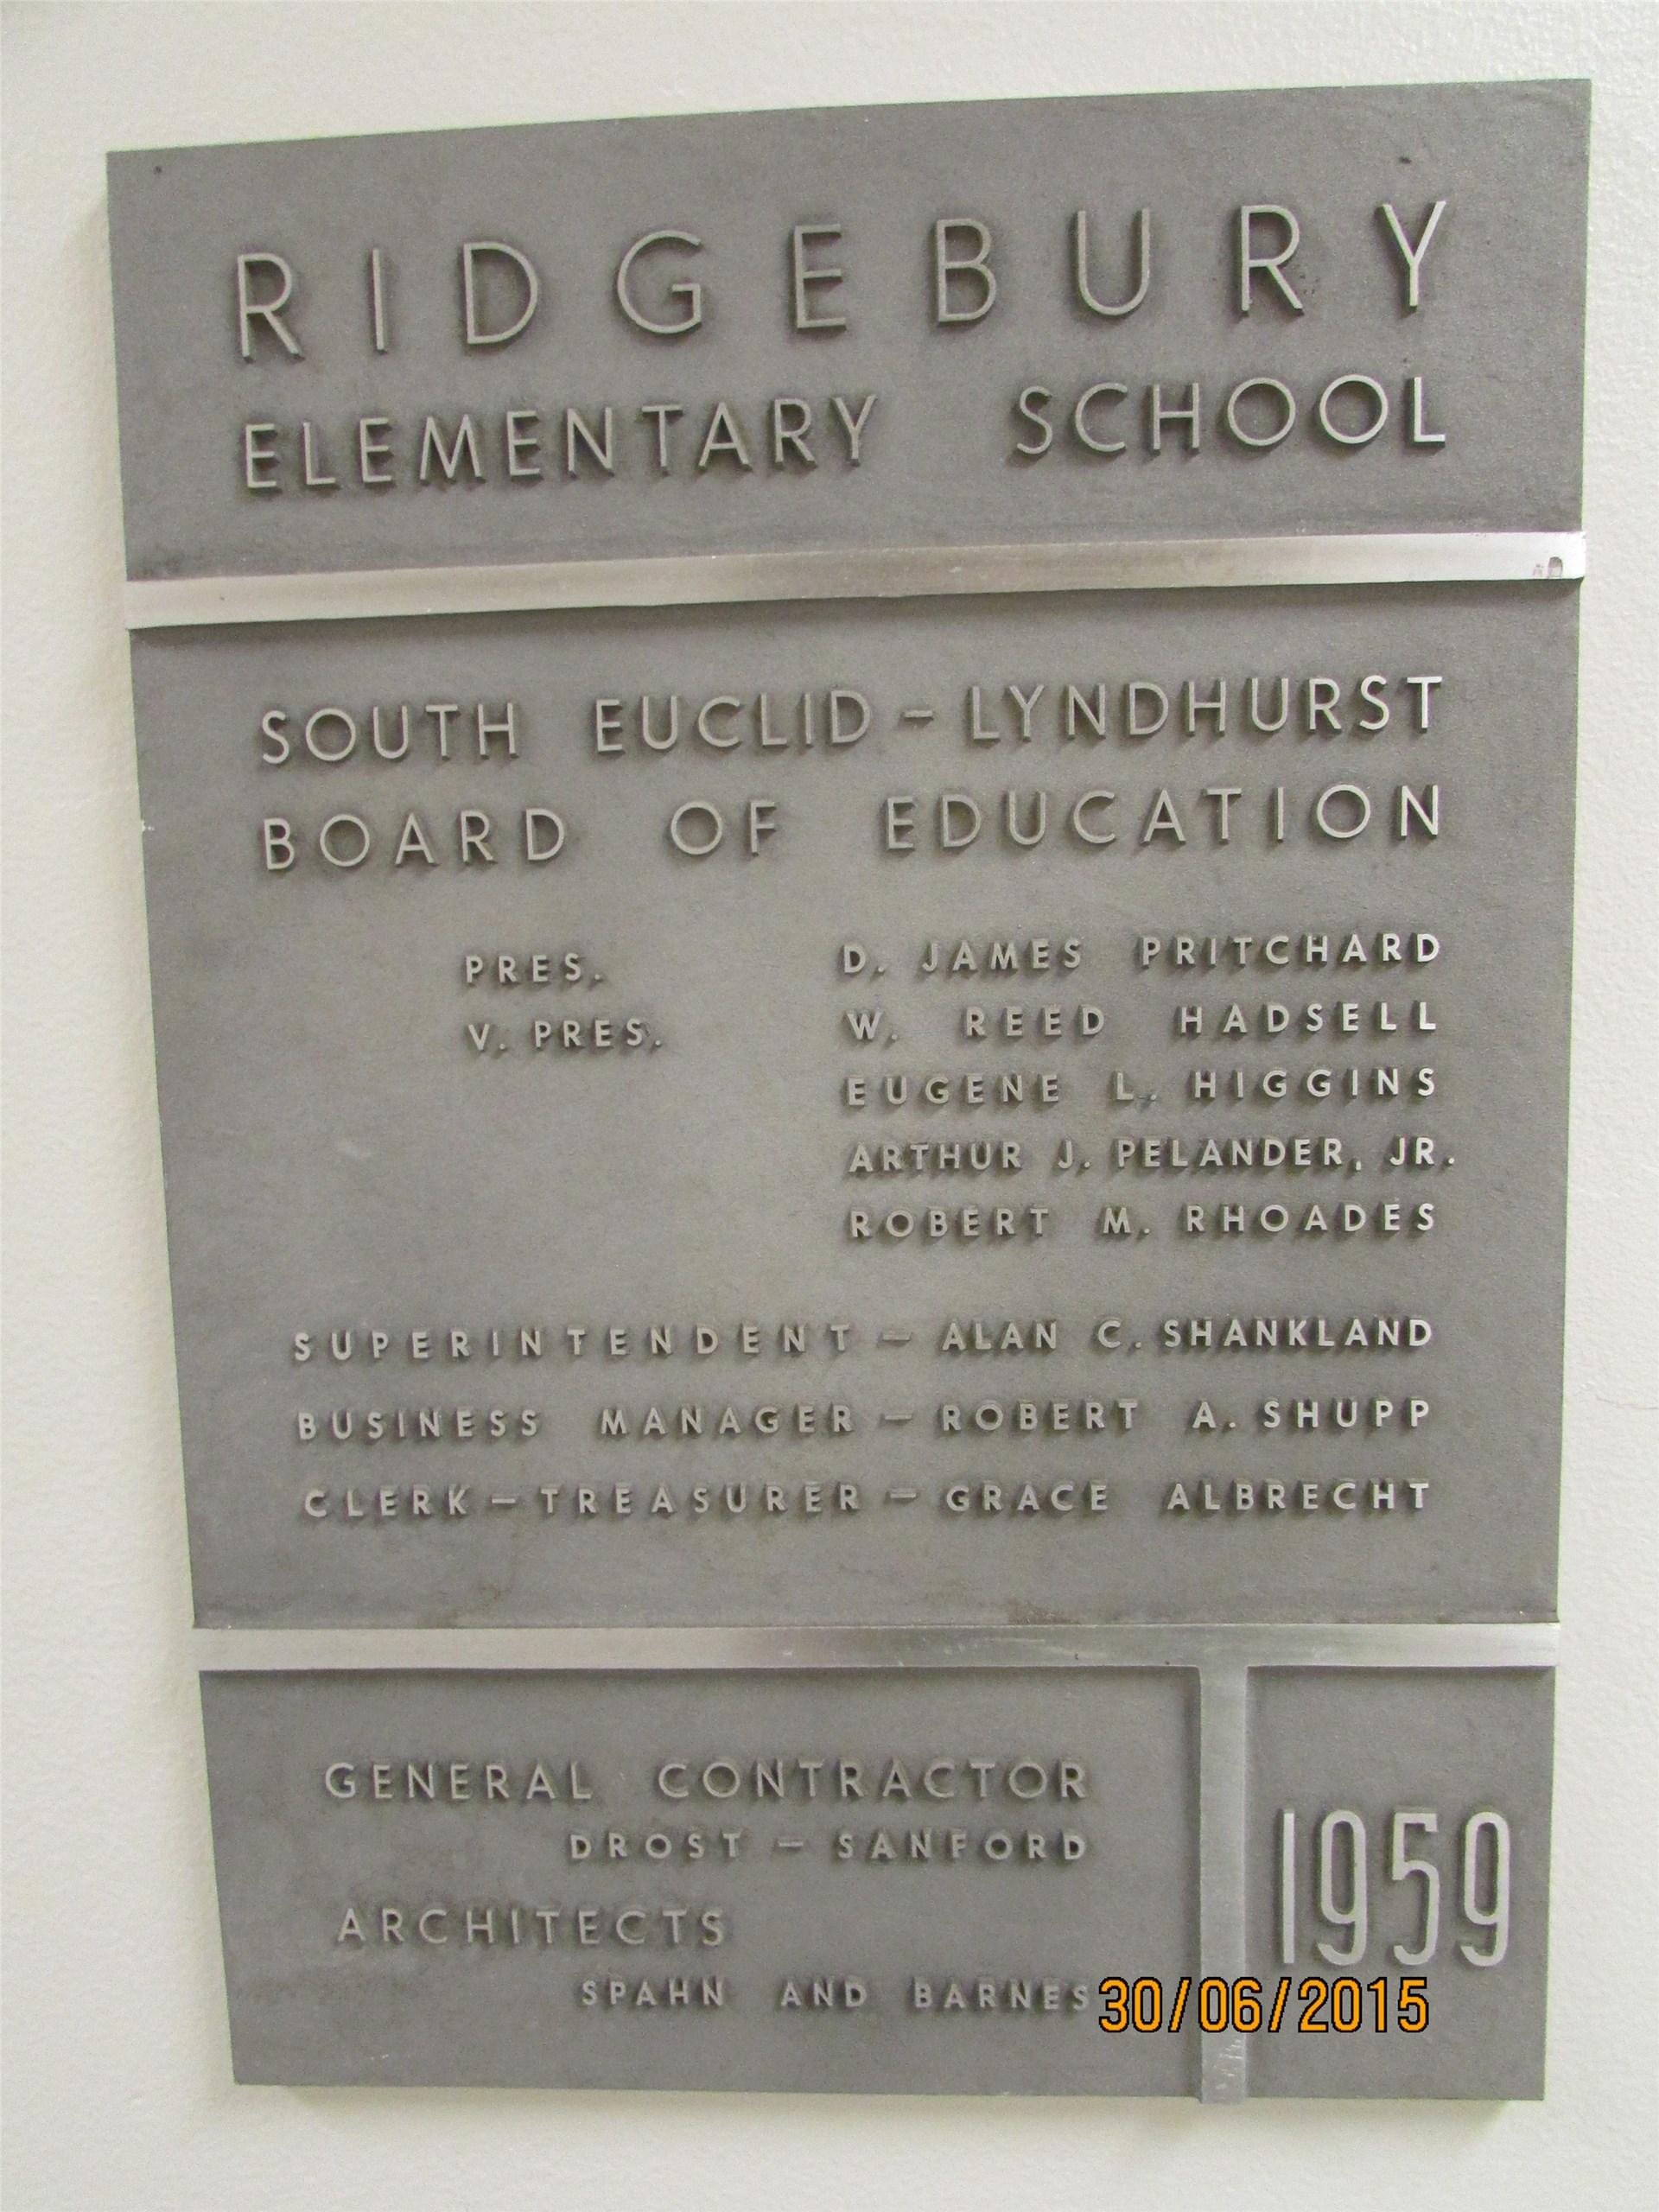 Ridgebury Elementary School - 1959